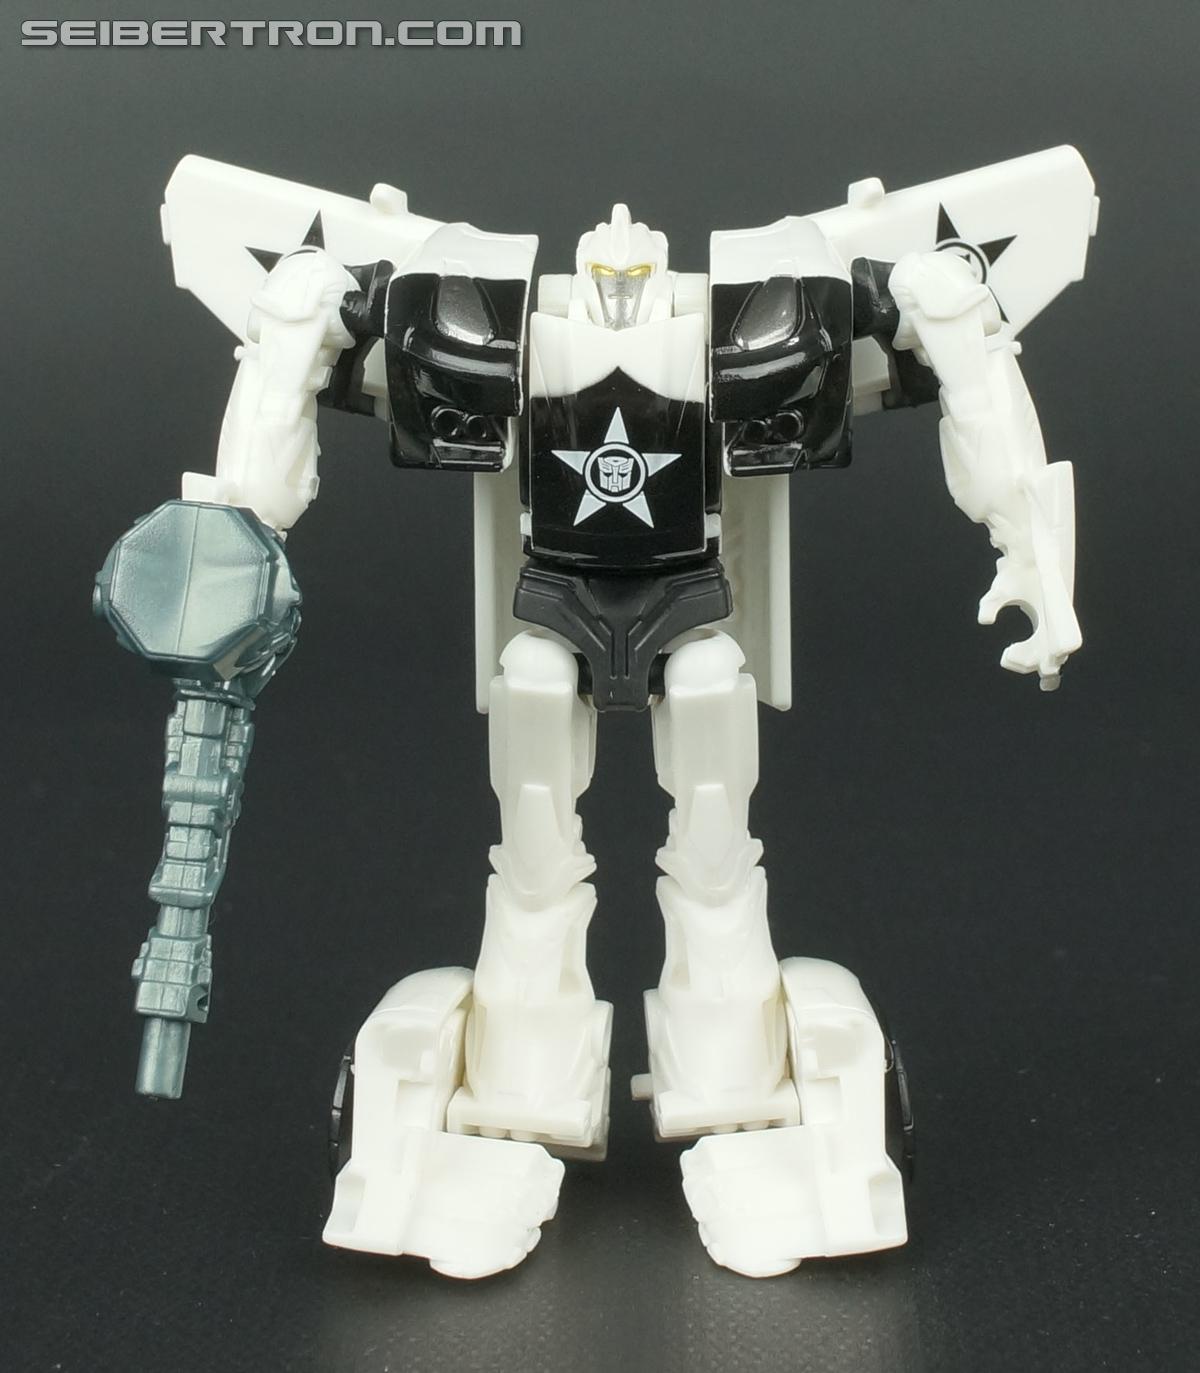 Transformers Prime Beast Hunters Cyberverse Prowl (Image #40 of 87)